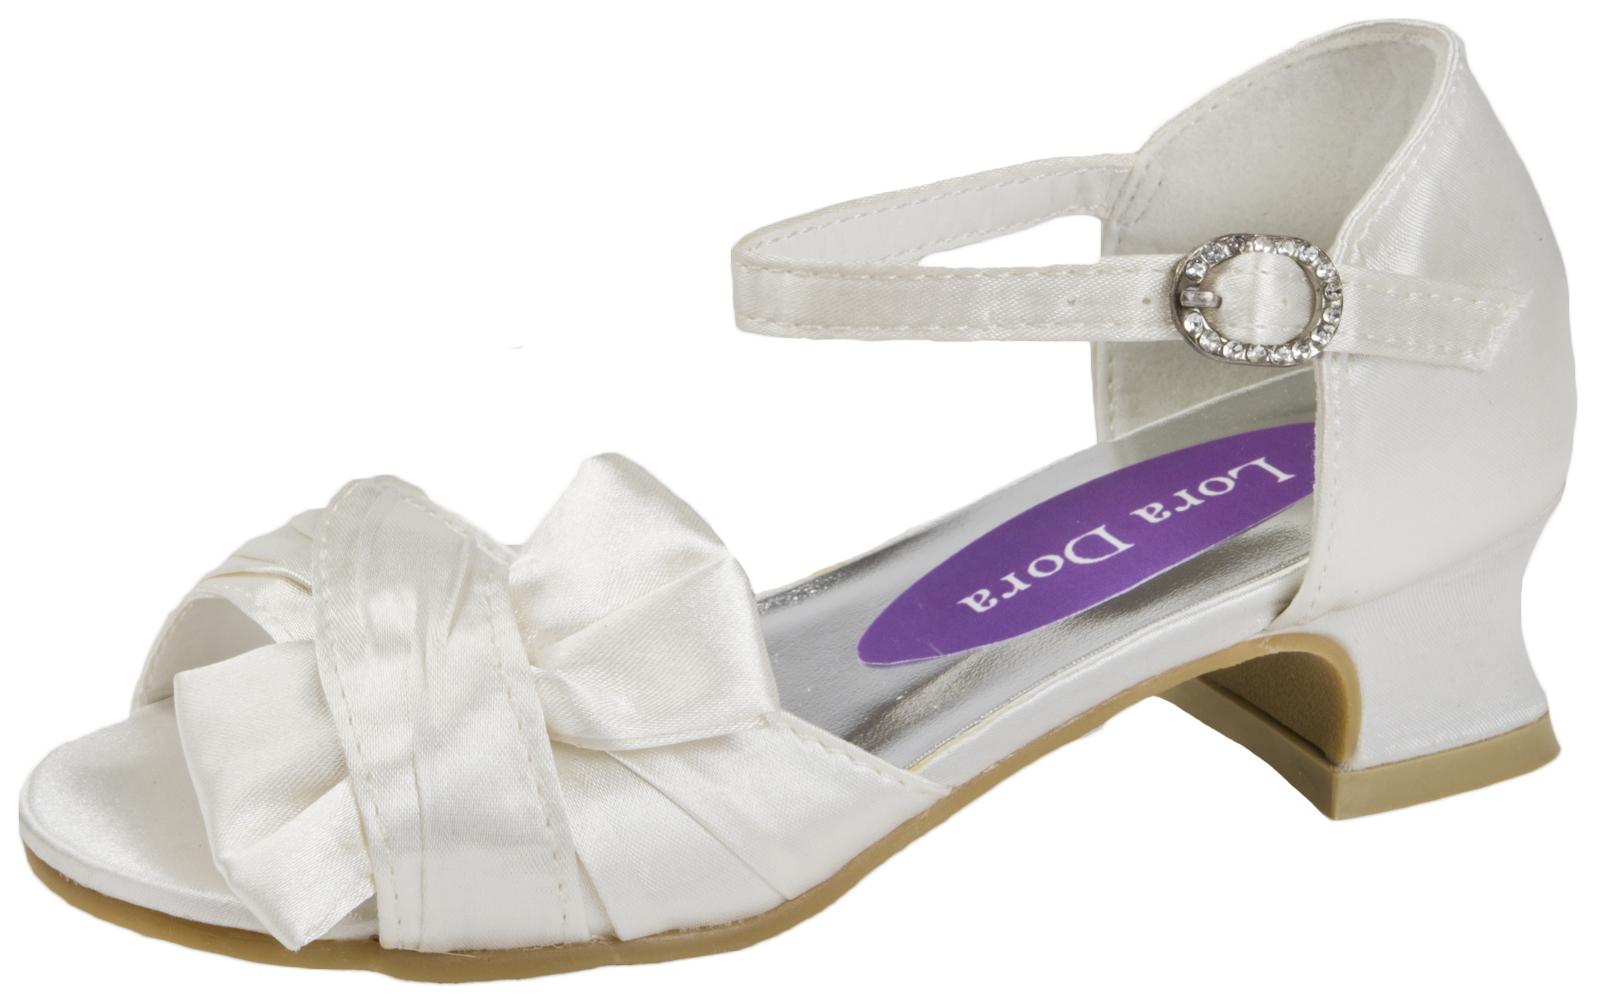 Kids High Heels Formal Wedding Shoes Open Toe Party ...